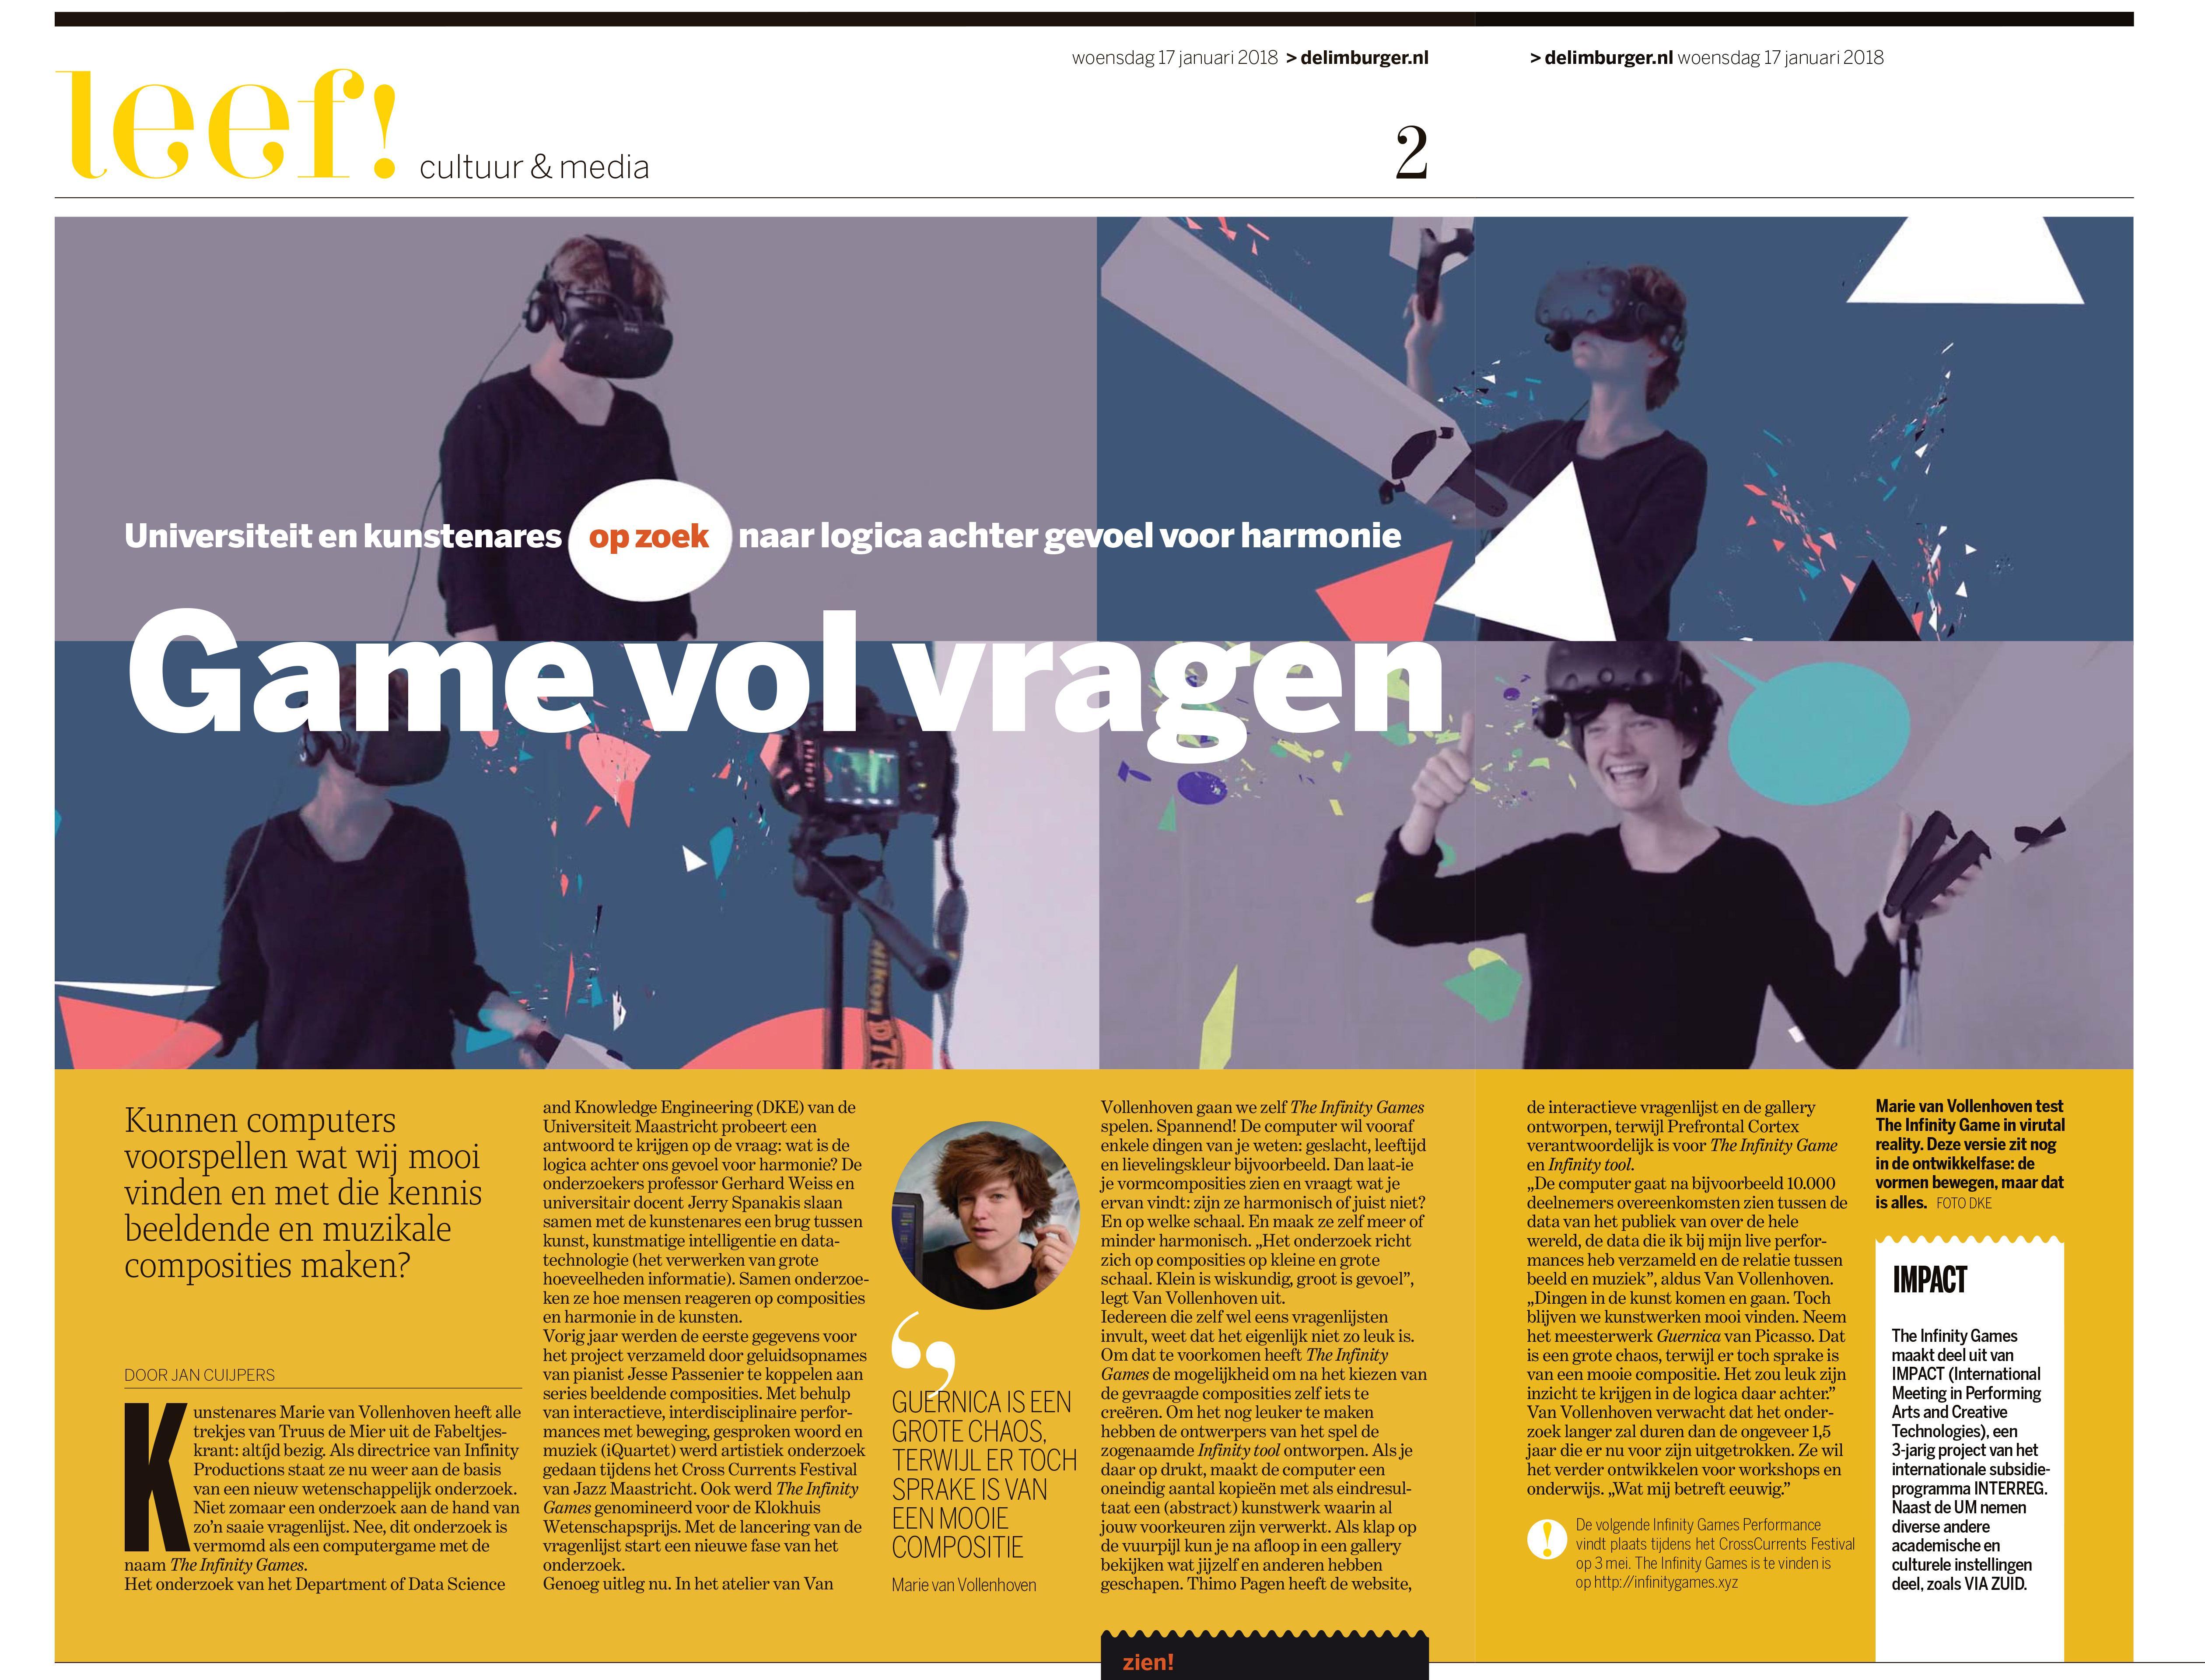 Article in De Limburger